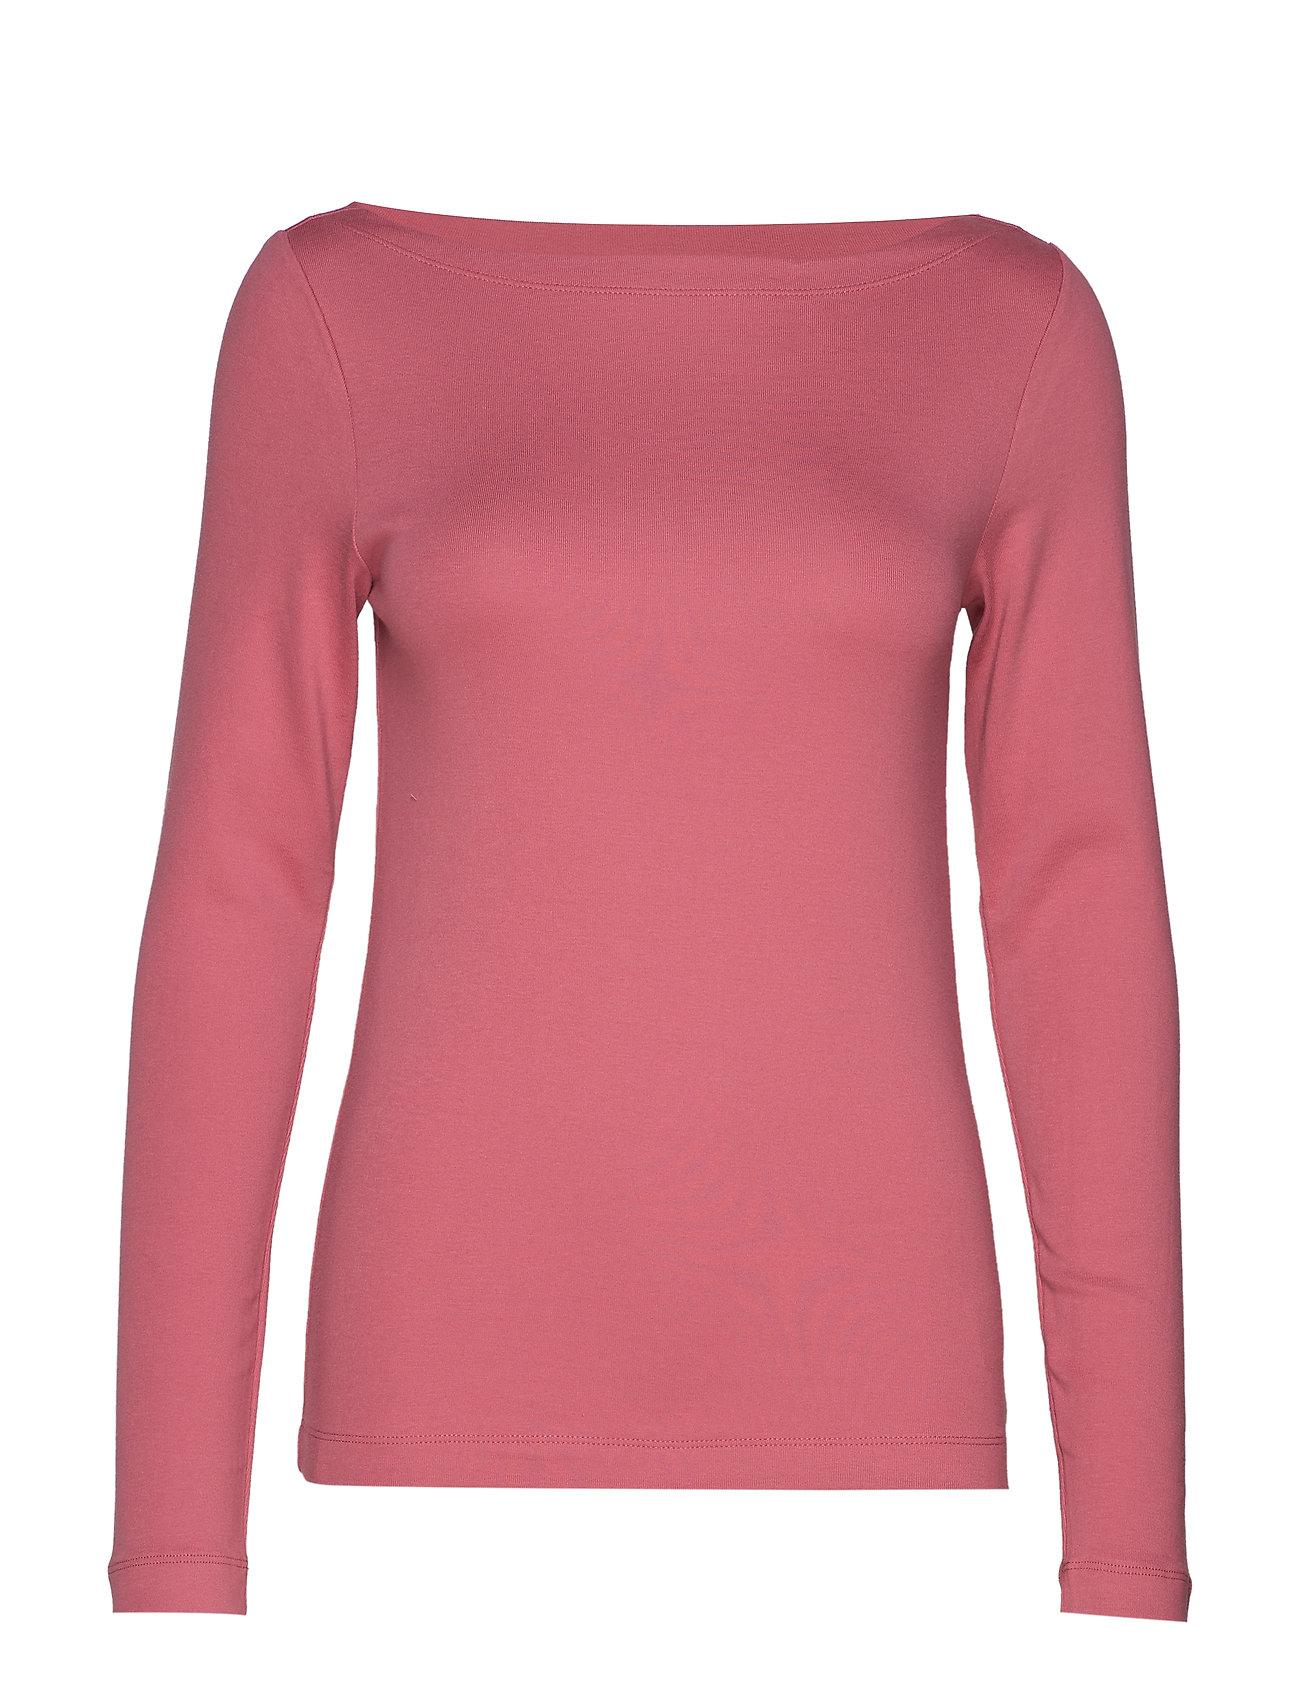 GAP Modern Long Sleeve Boatneck T-Shirt - WILD ROSE